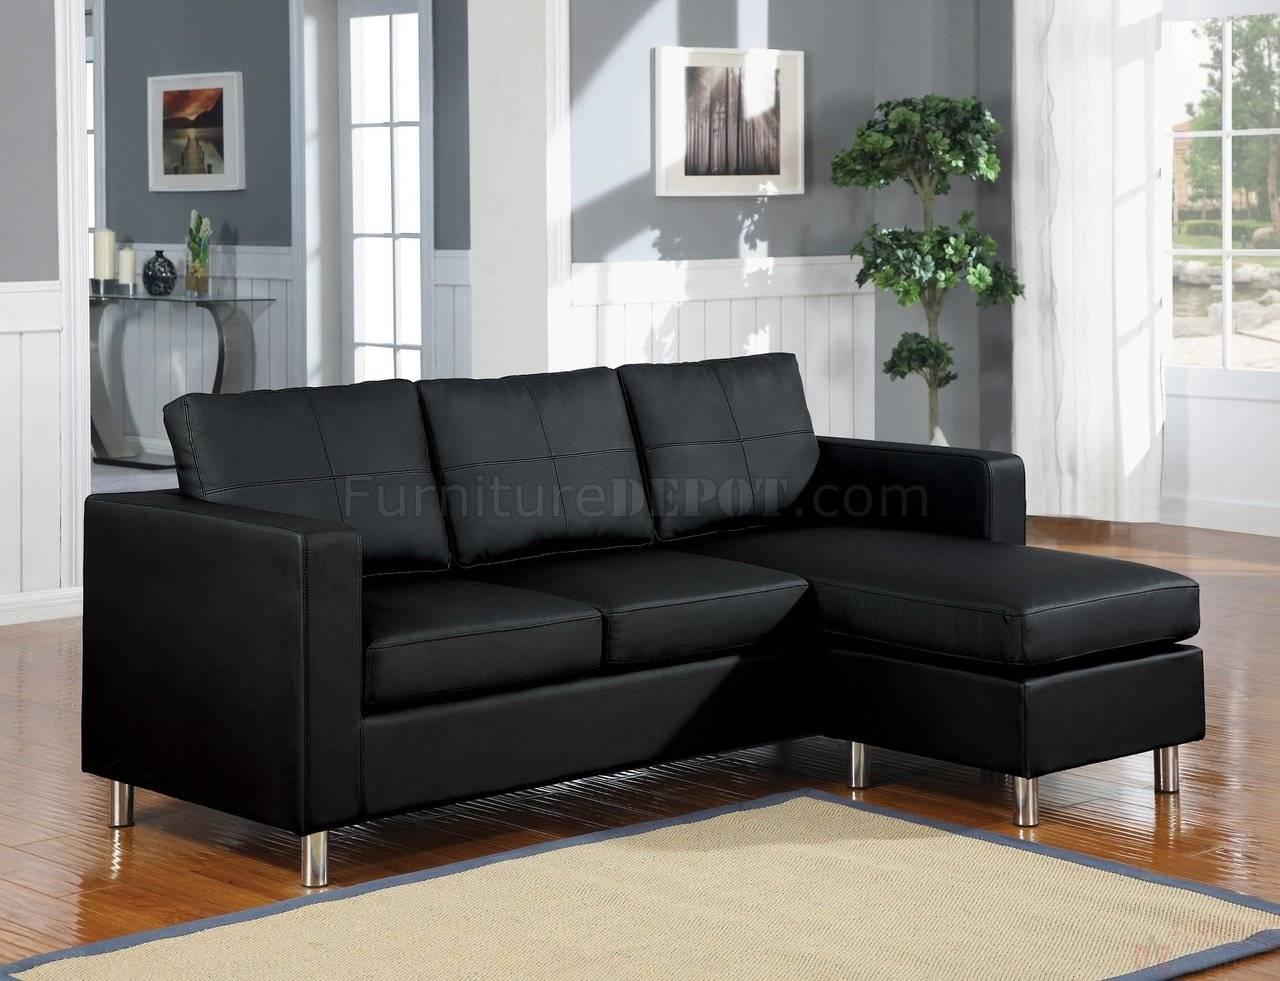 15065 Kemen Sectional Sofa In Black Vinylacme throughout Black Vinyl Sofas (Image 2 of 15)